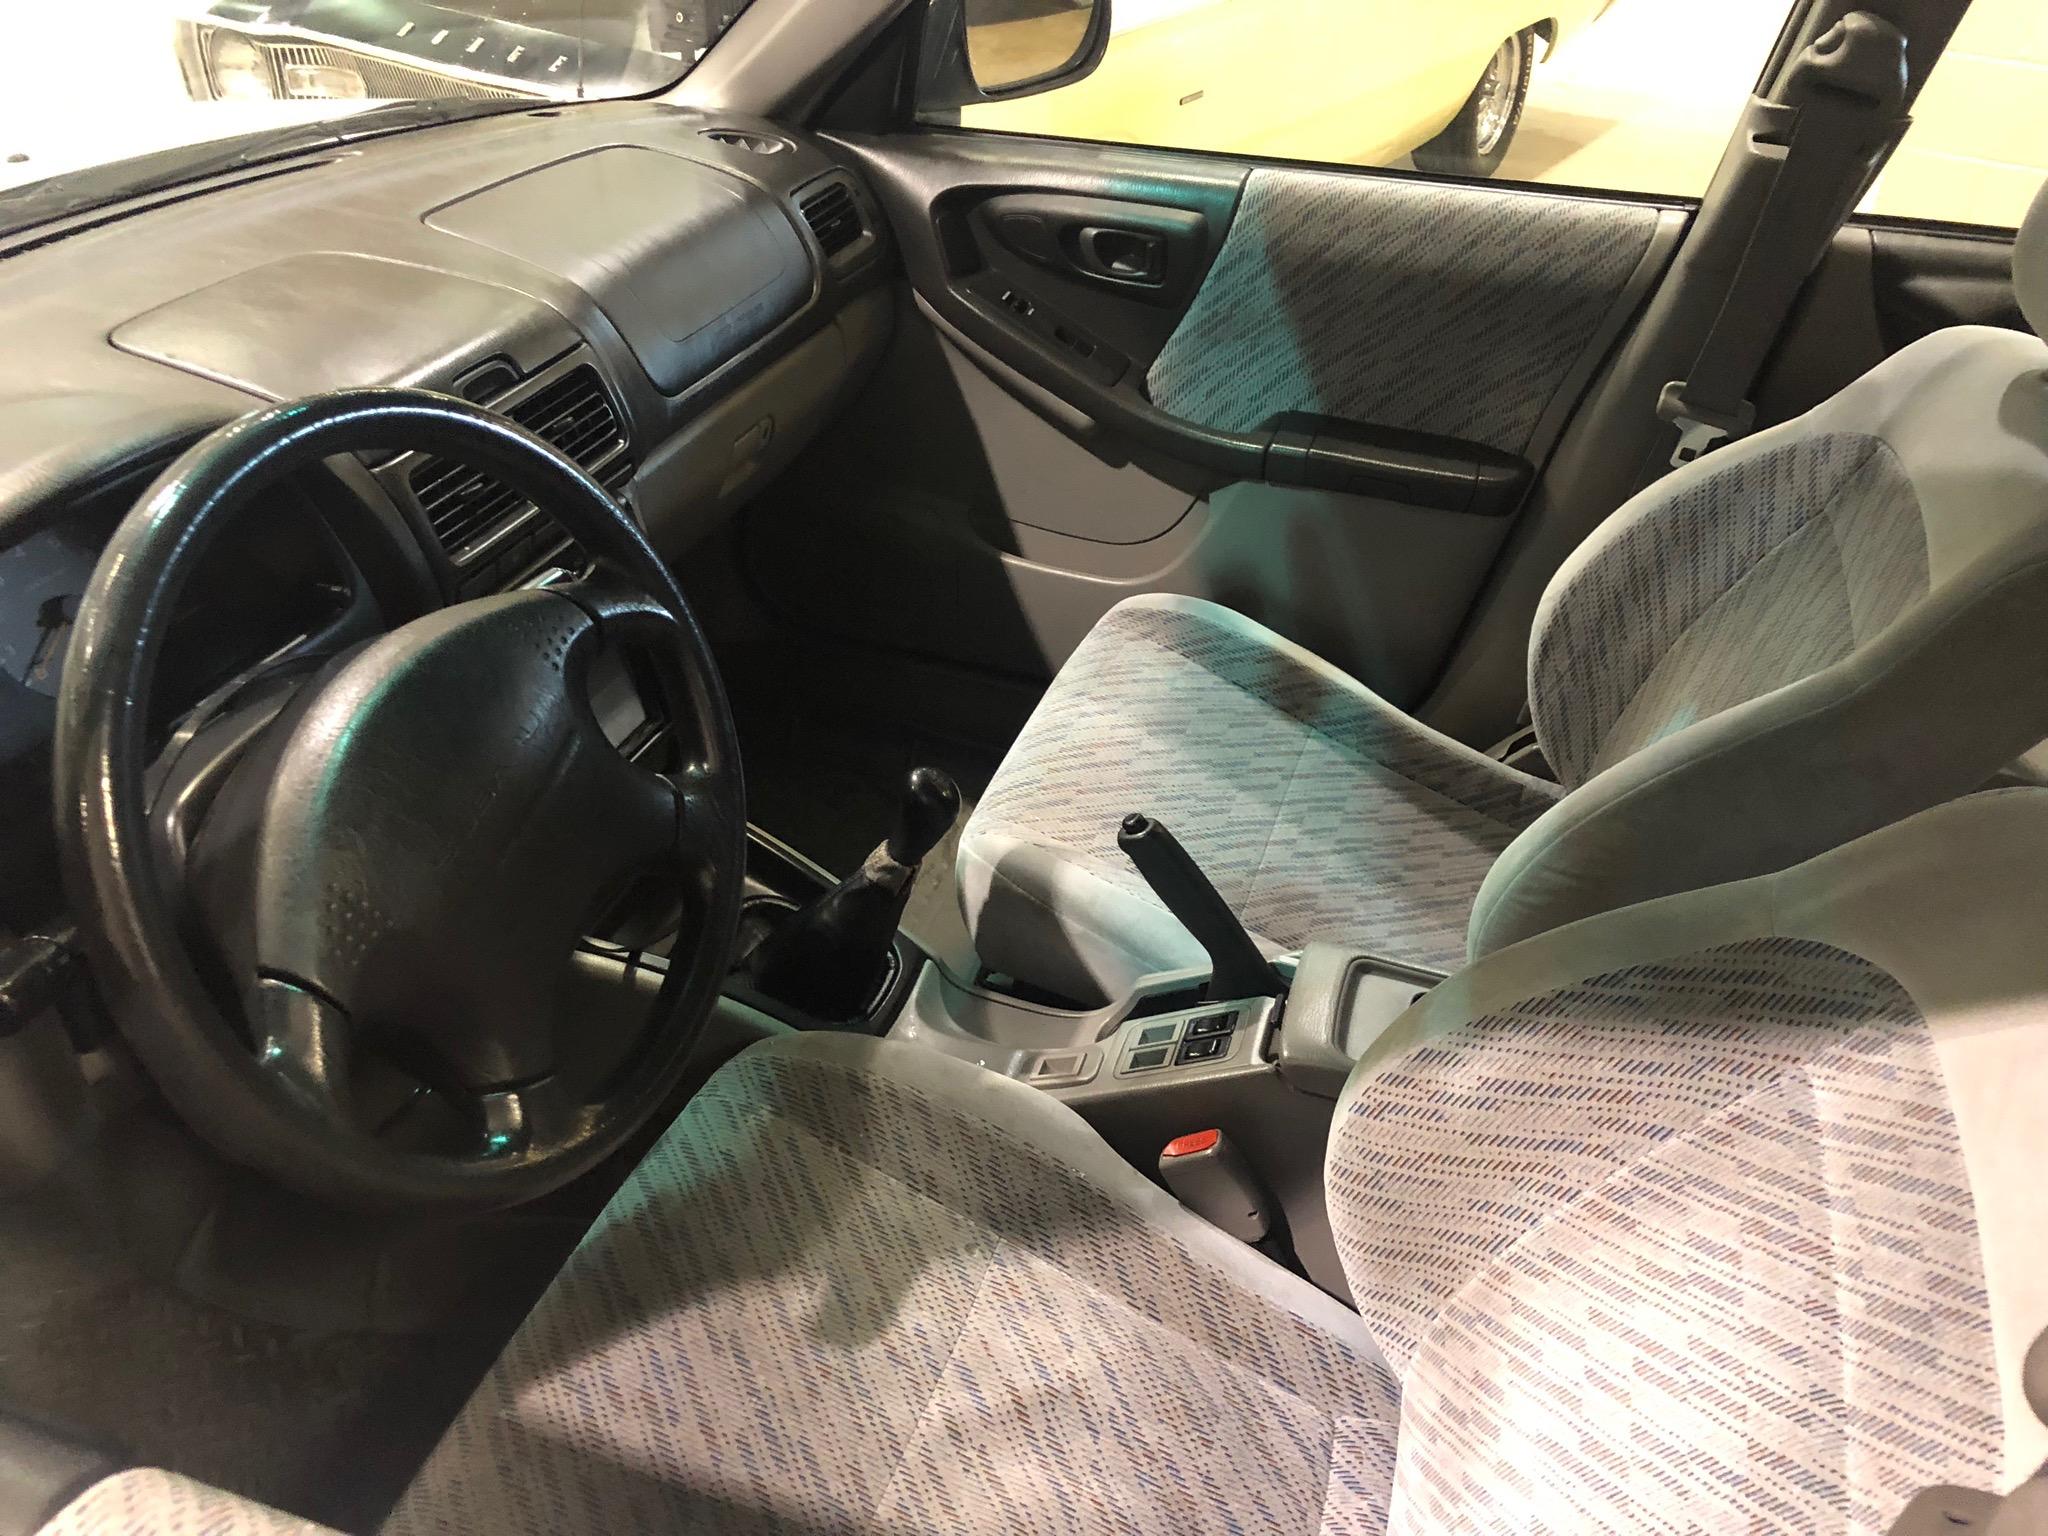 1998 Subaru Forrester